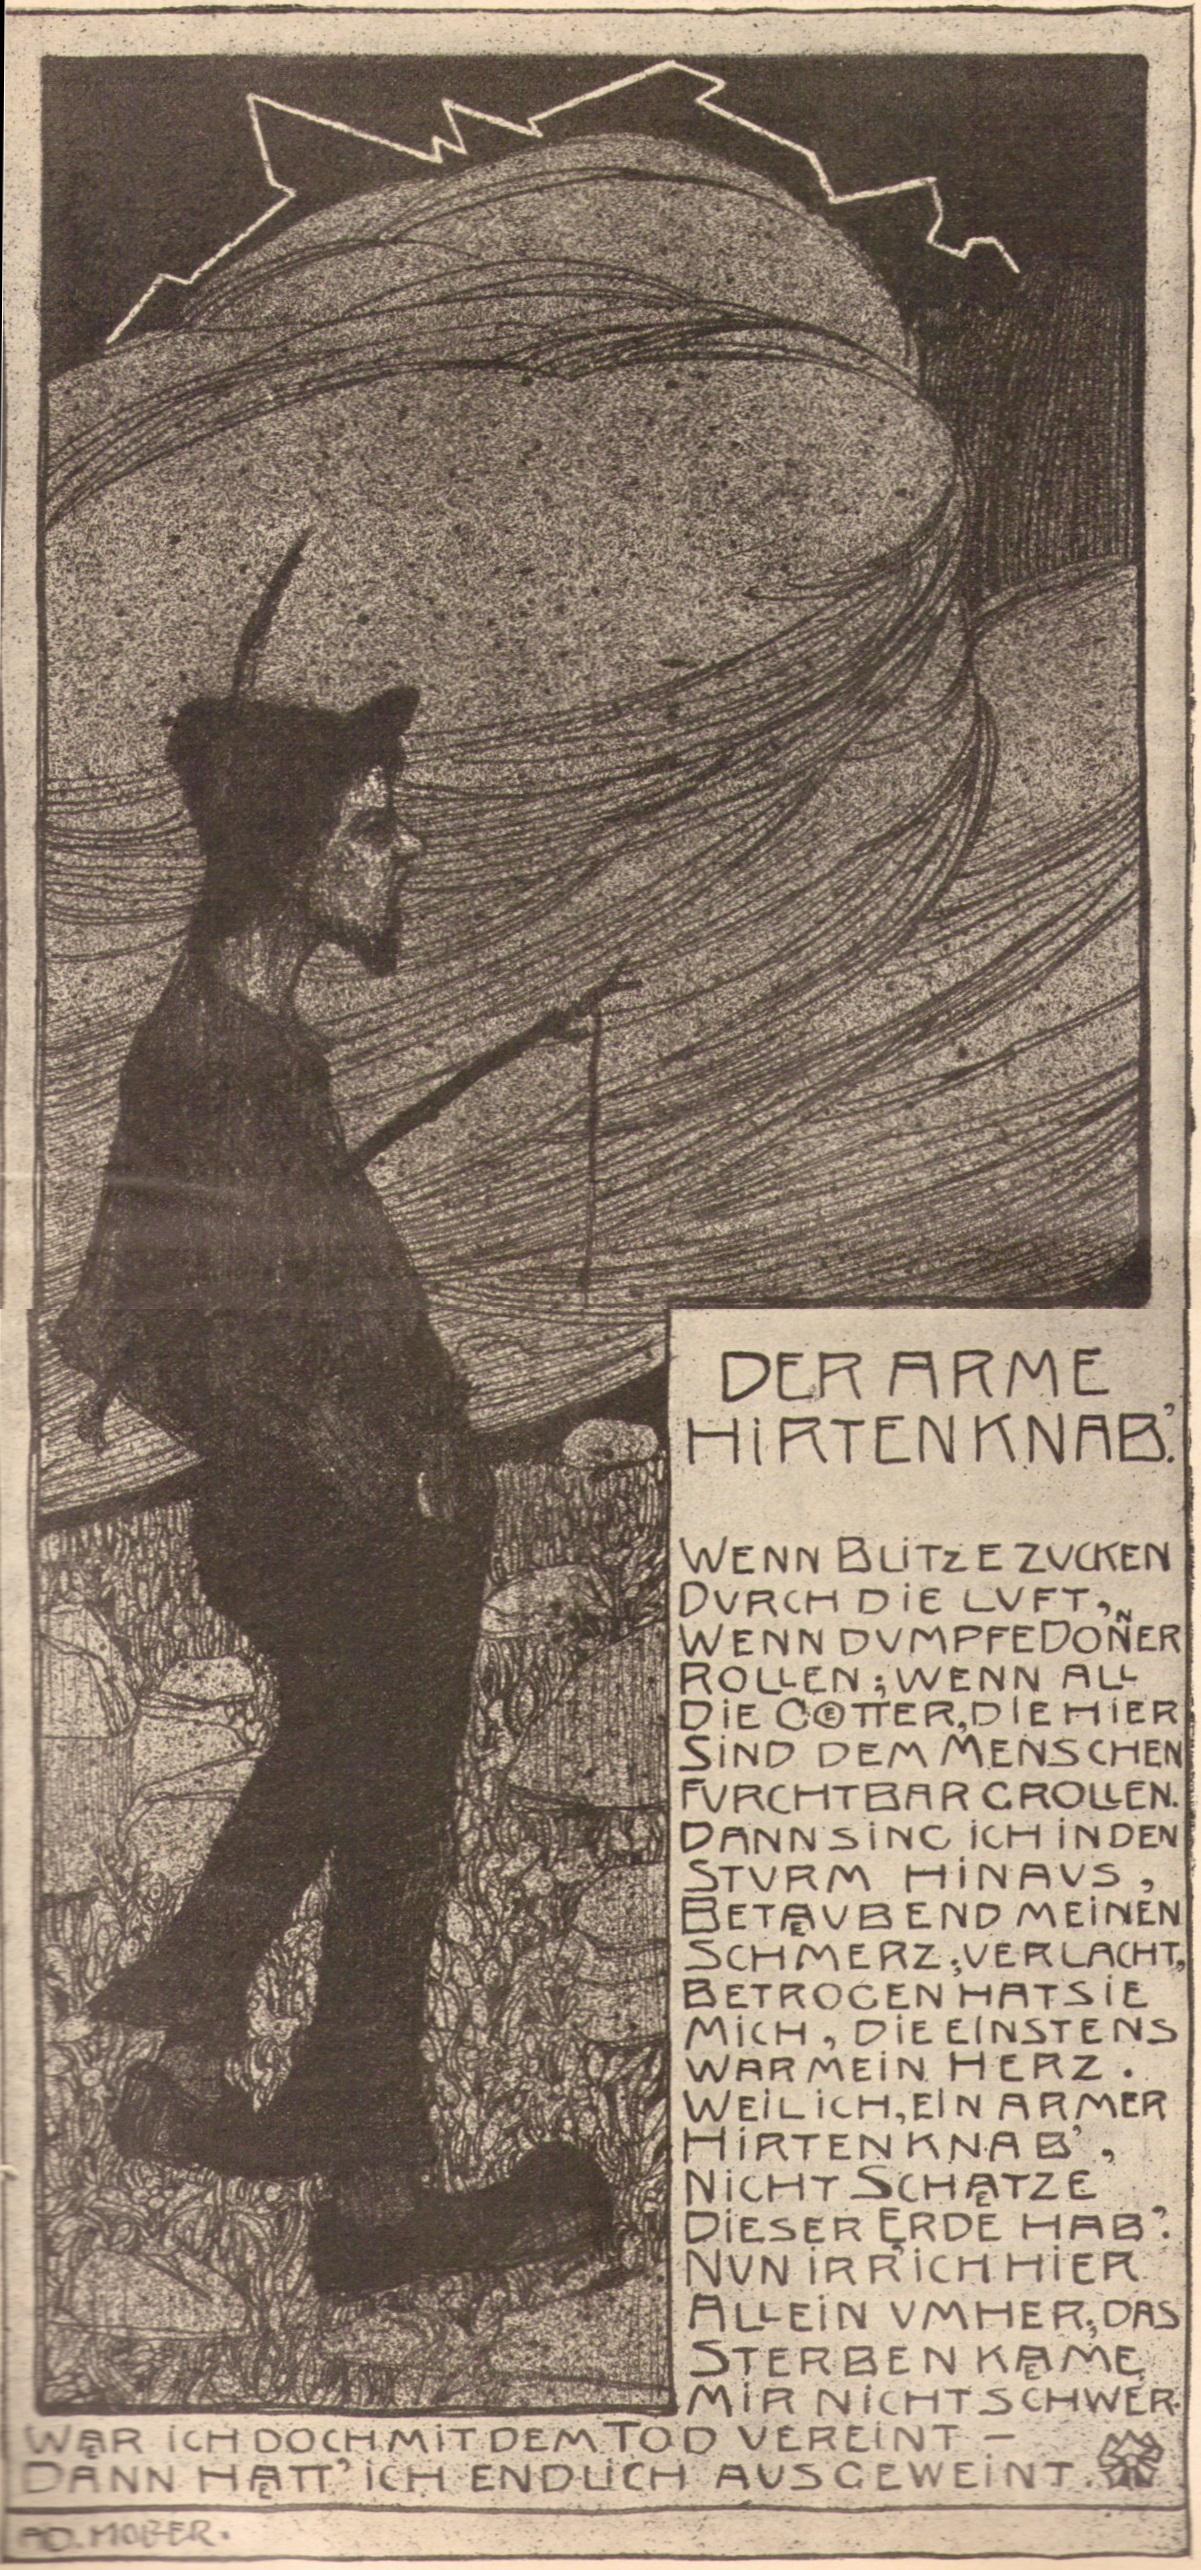 Adalbert Holzer - Der arme Hirtenknab 1904p.jpg